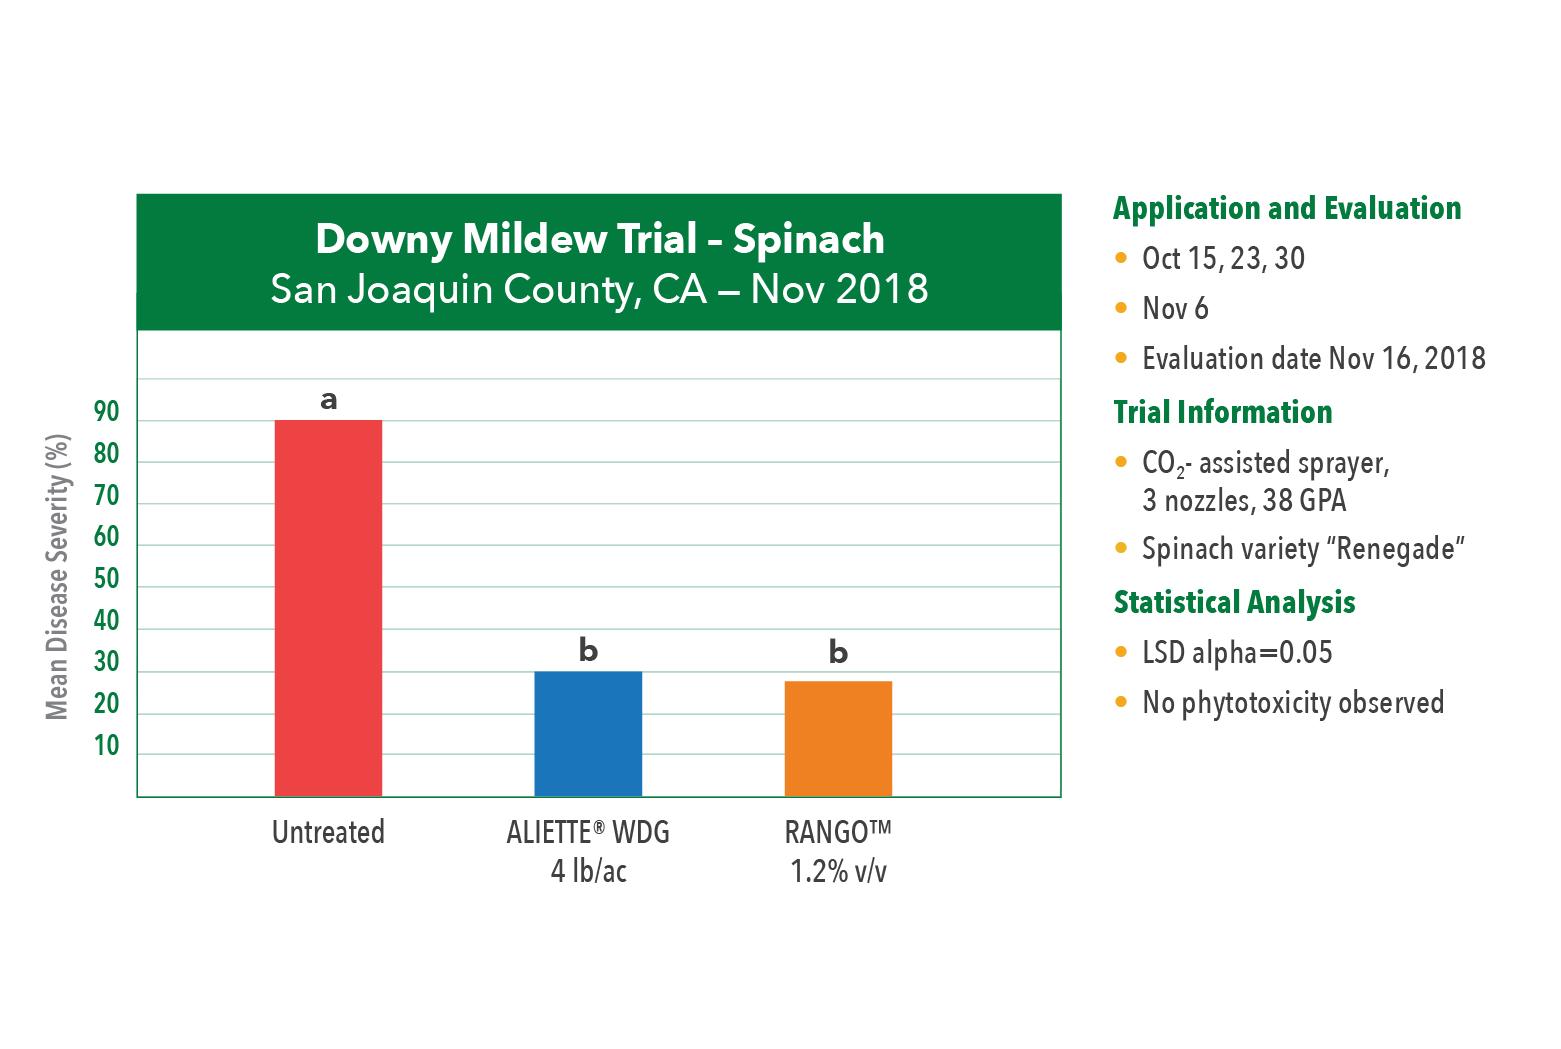 Terramera-RANGO-Lettuce-Chart-02-Downy Mildew Trial – Spinach (Renegade var)